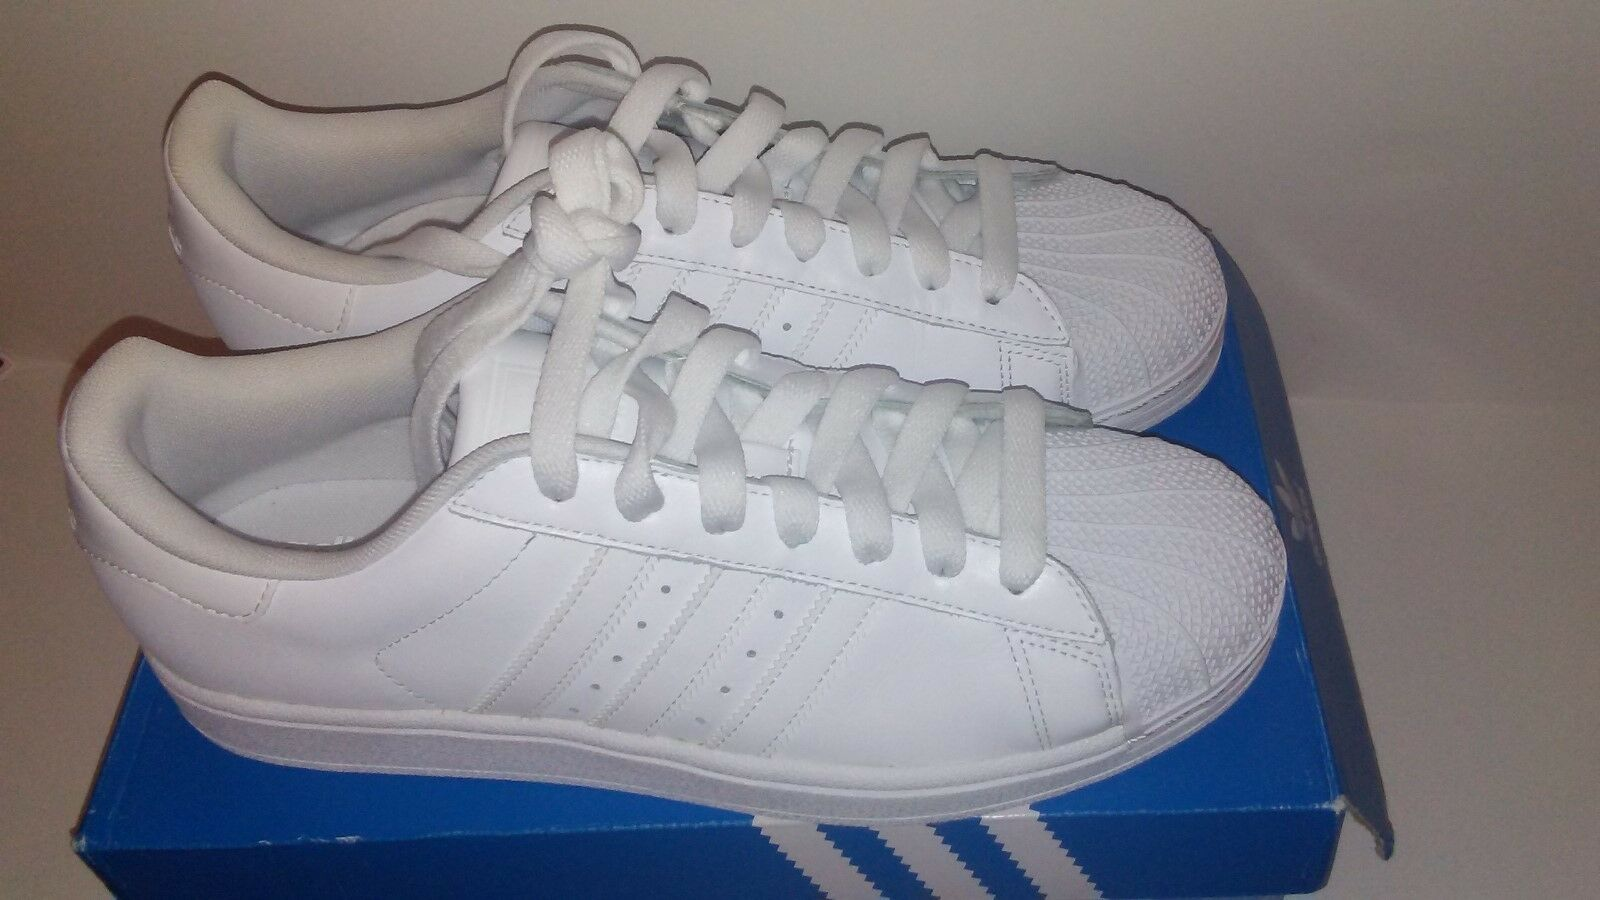 Adidas superstar ii bianco Uomo 10 shelltoes scarpe 10 Uomo fdb94d